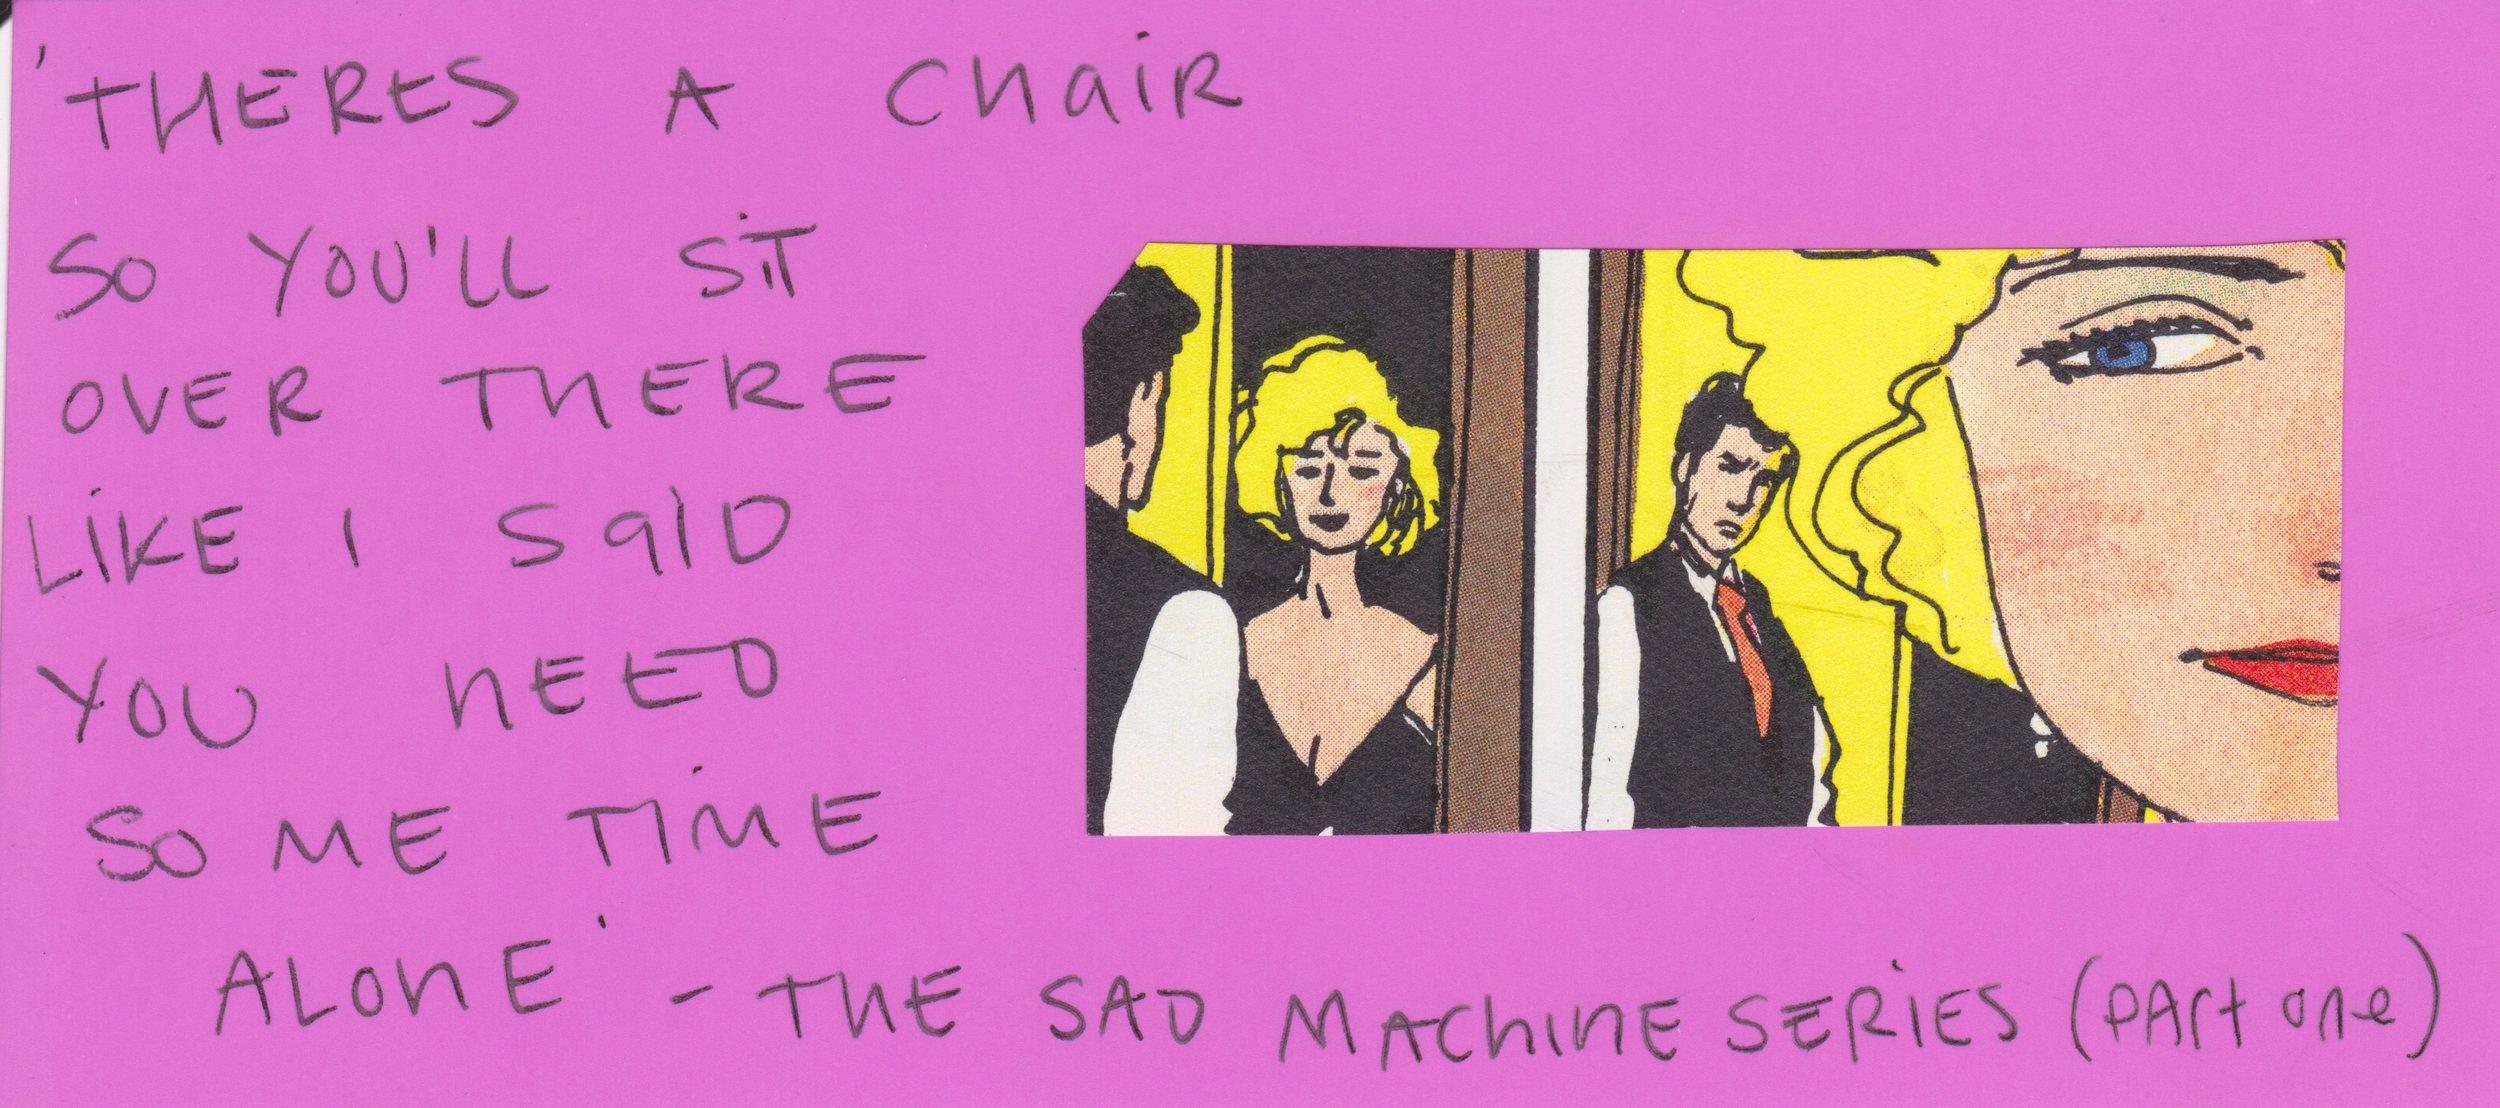 The Sad Machine Series Quotes 21.jpeg